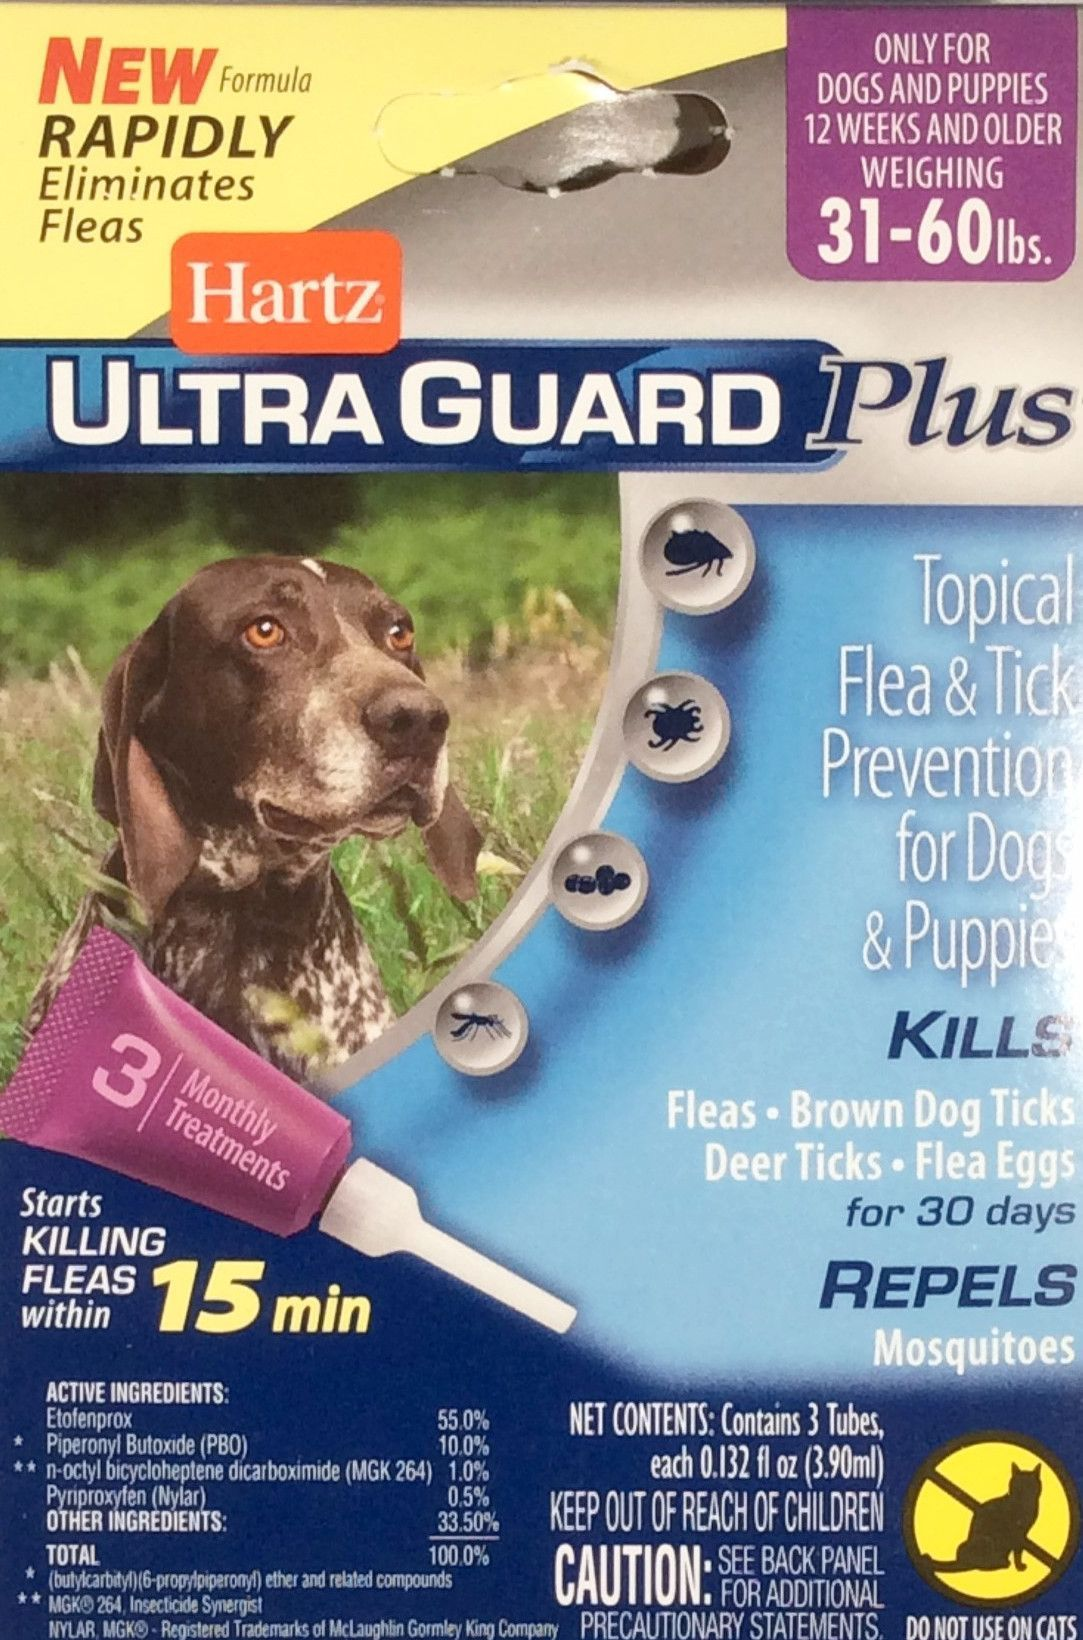 Hartz Ultra Guard Plus Topical Flea Tick Dogs Puppies Brown Dog Tick